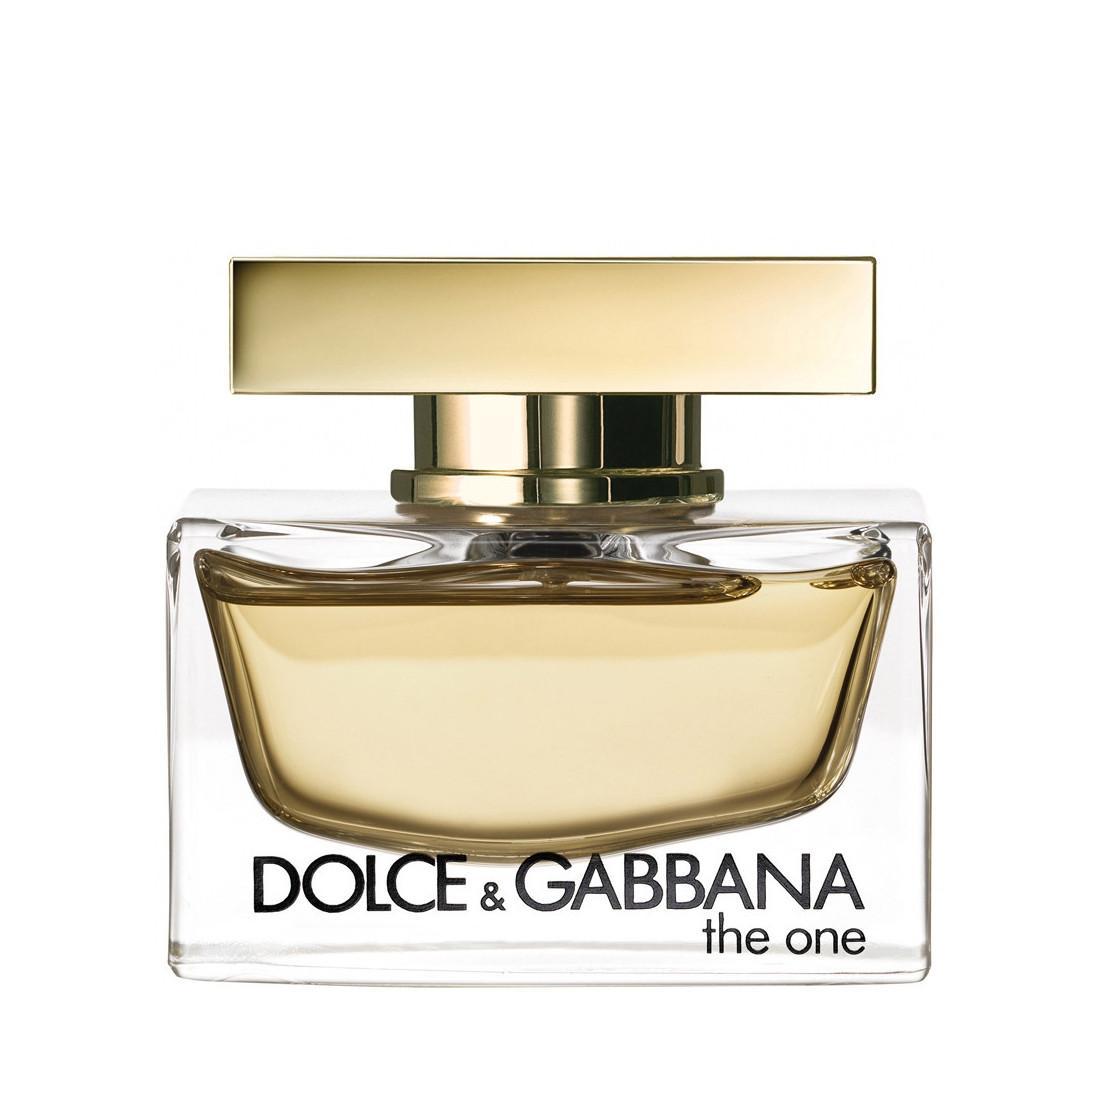 Dolce&Gabbana The One For Women Eau De Parfum